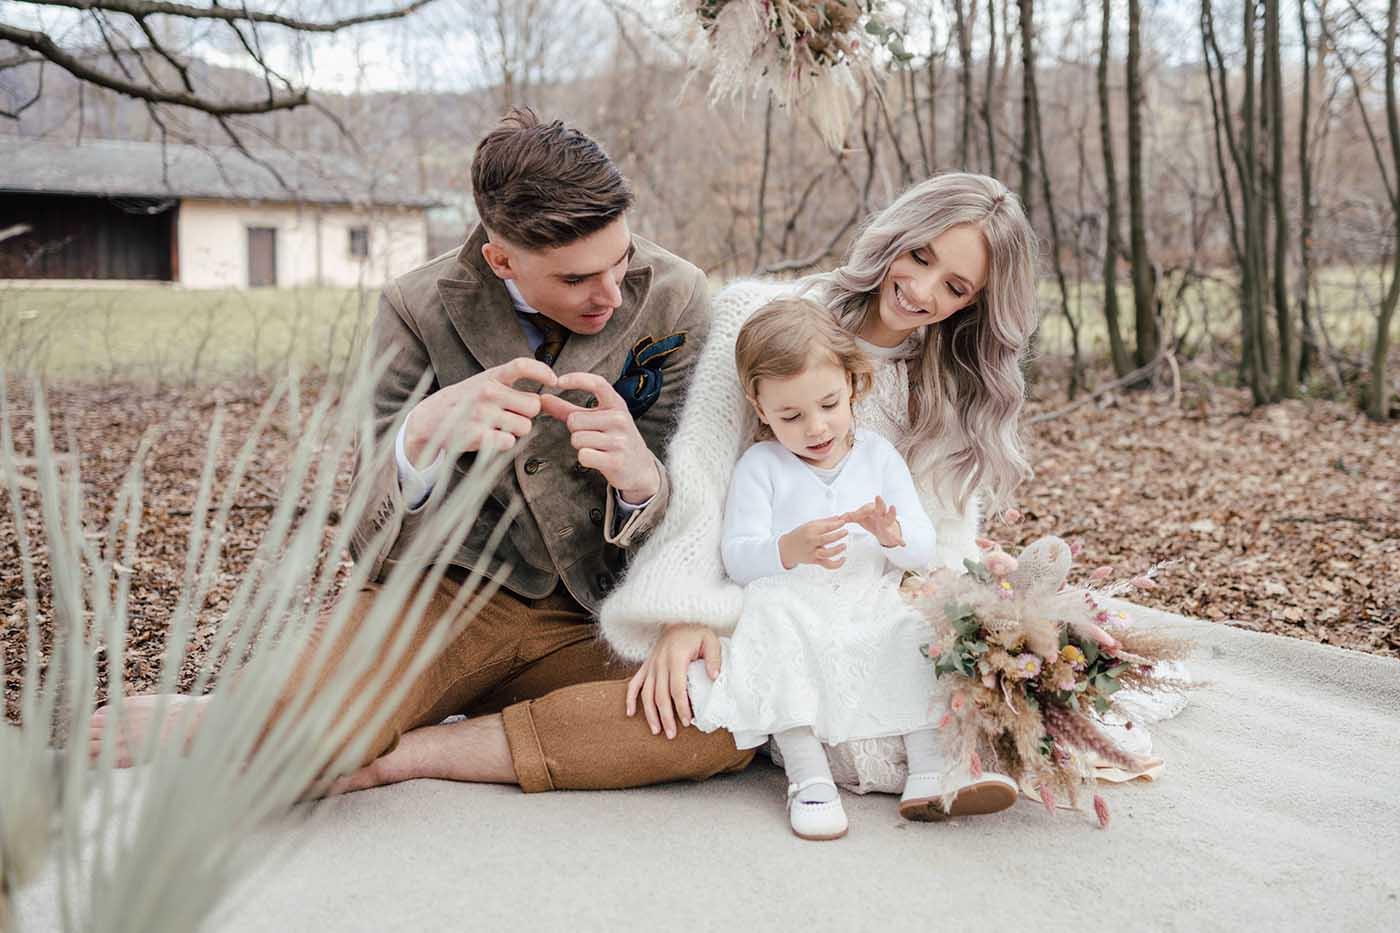 glory days WEDDINGS | Hochzeitsplanung